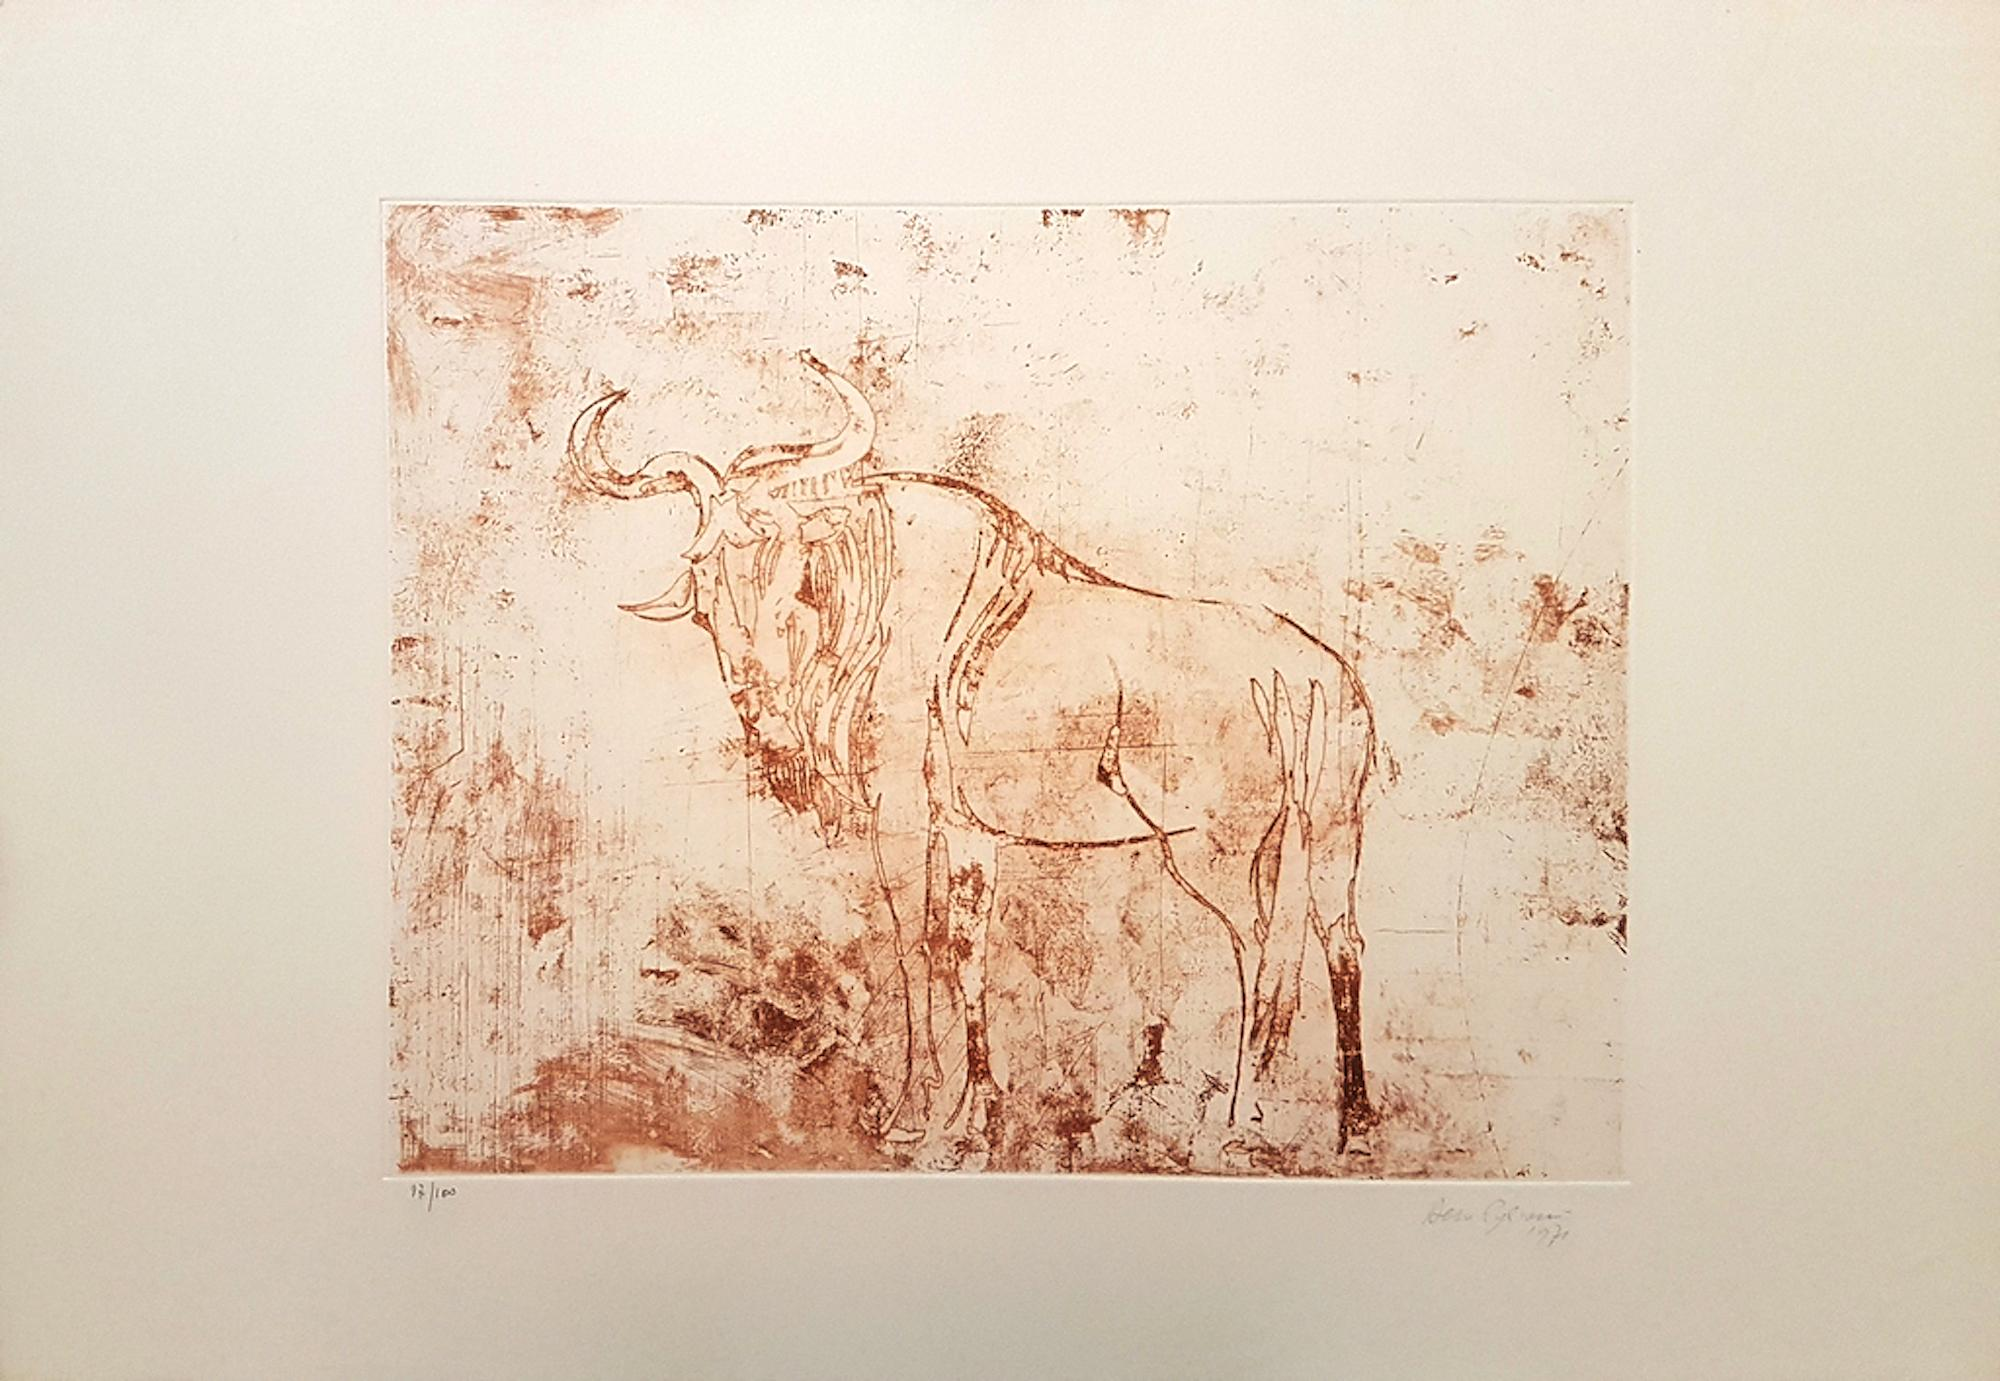 Buffalo - Original Etching by Aldo Pagliacci - 1971